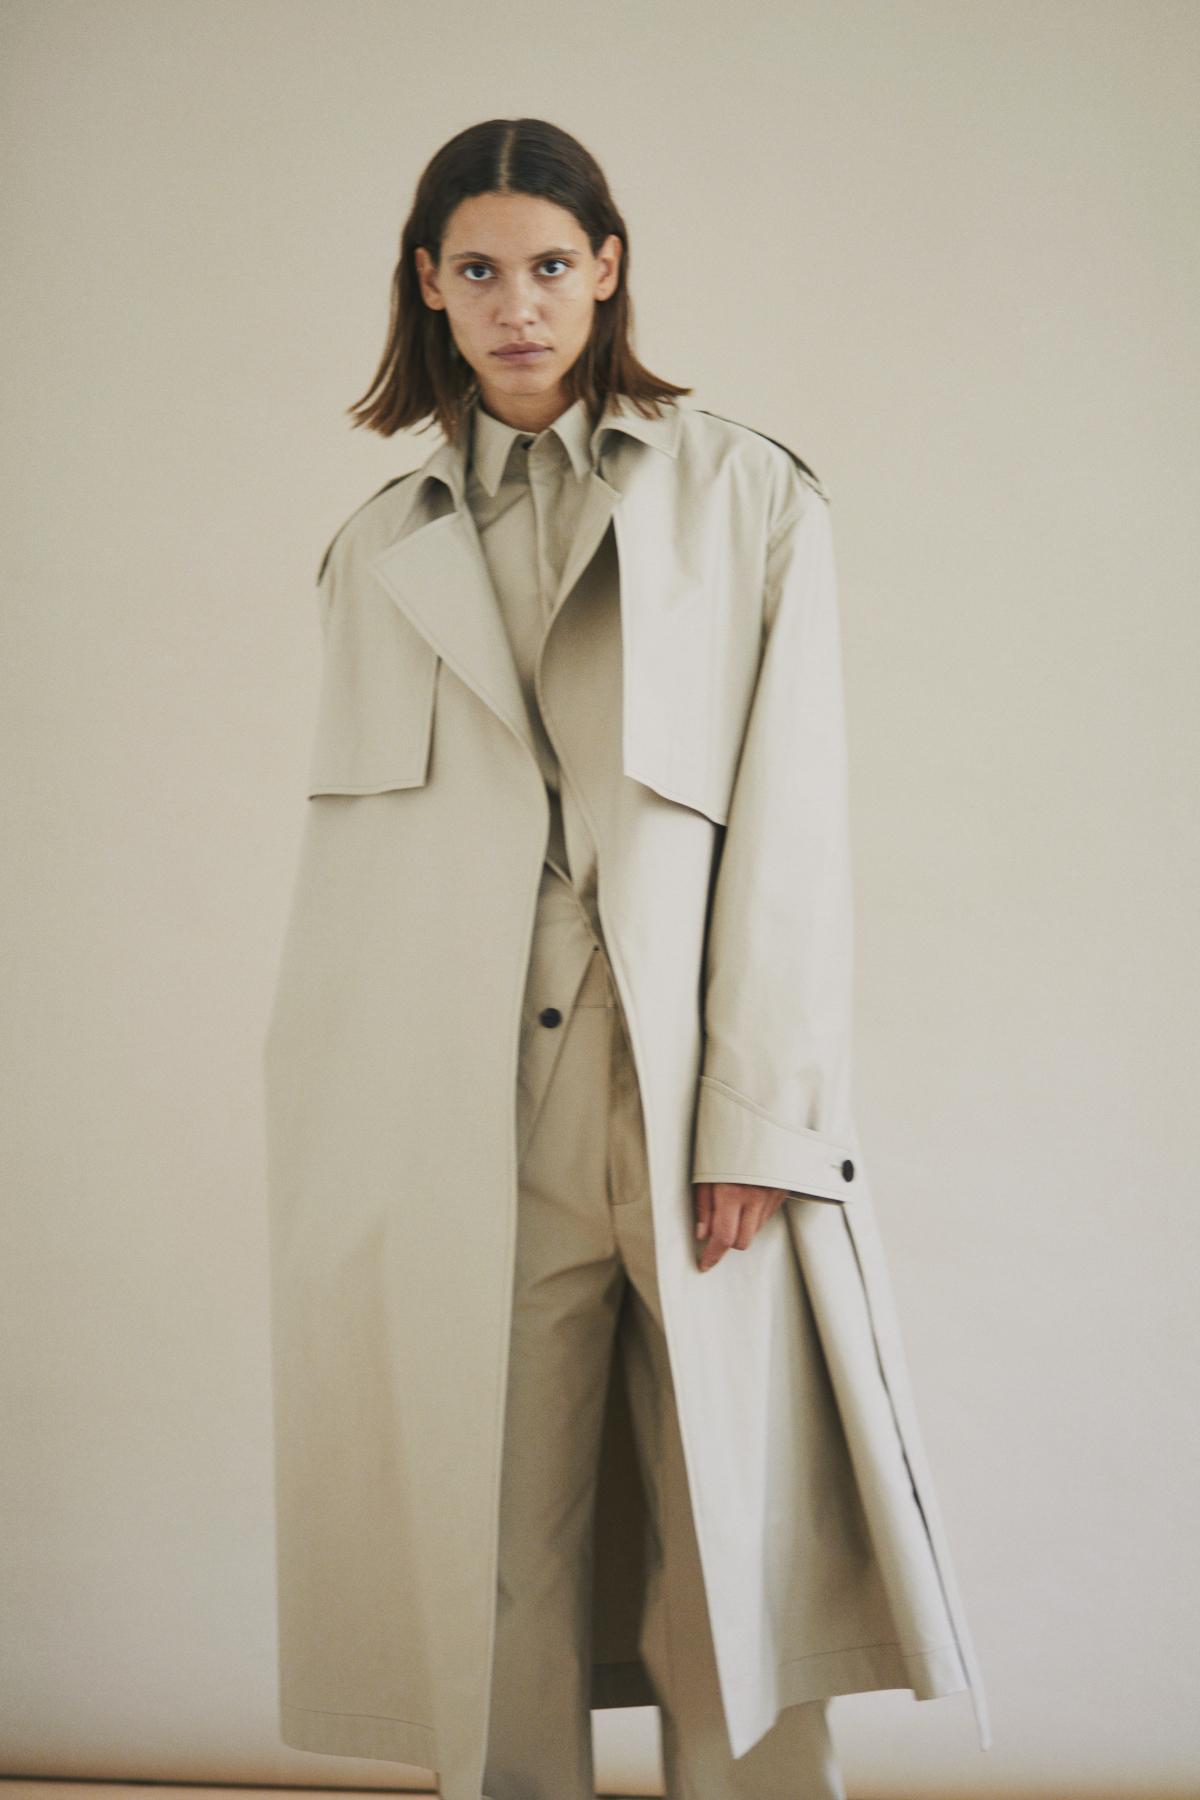 Coat SHEILA, Shirt SANDA, Trousers SELINE